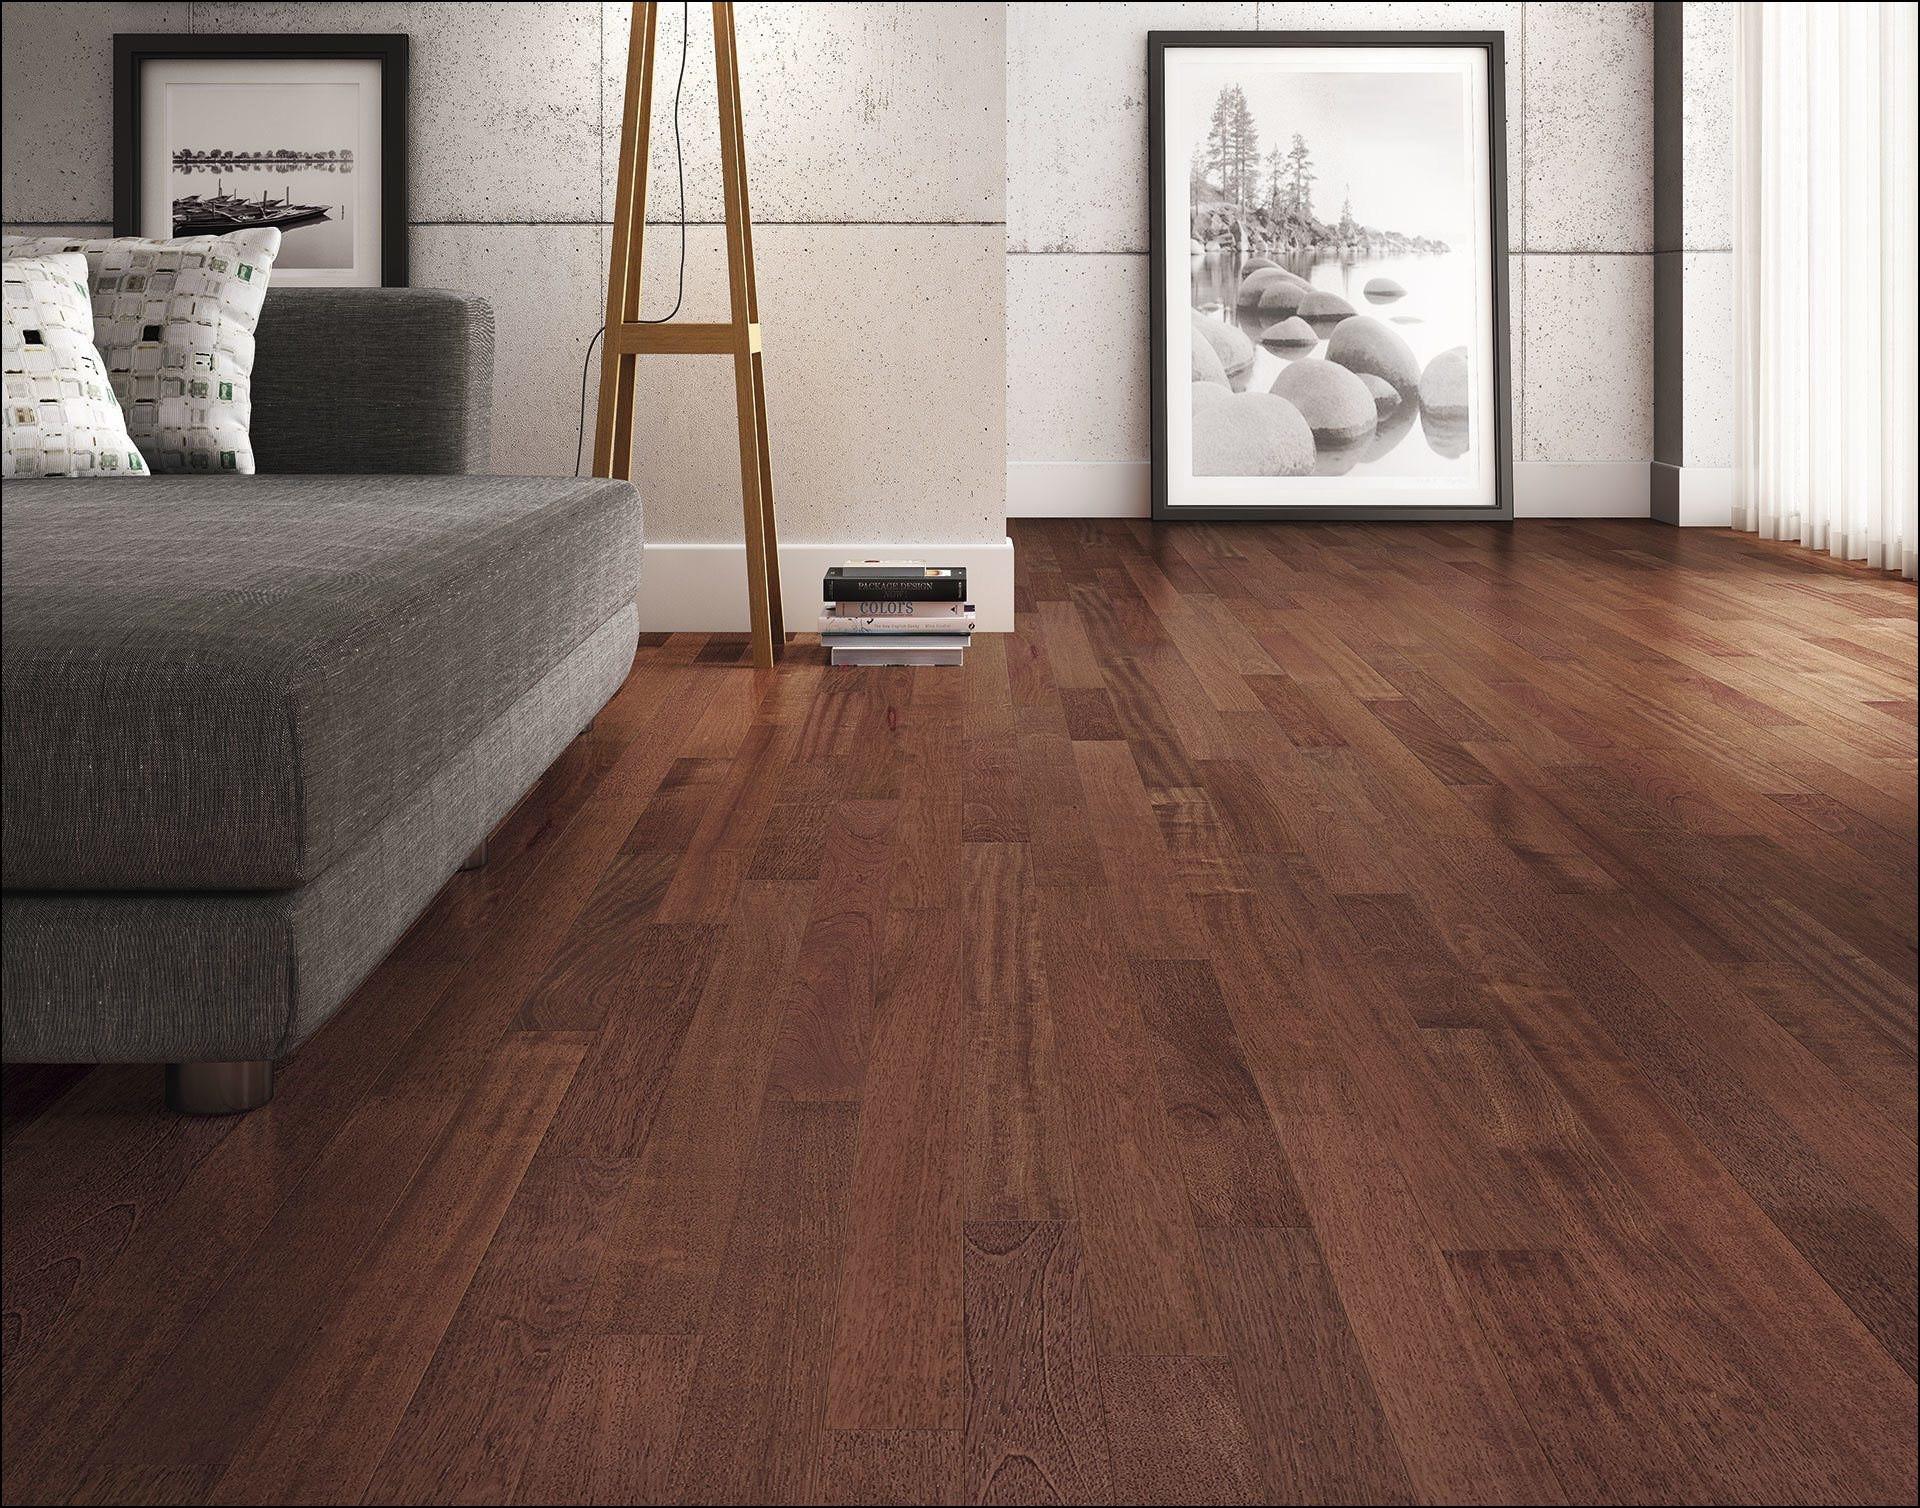 bruce hardwood floors lowes of wide plank flooring ideas regarding wide plank wood flooring lowes galerie laminate flooring durability bamboo flooring vs hardwood laminate of